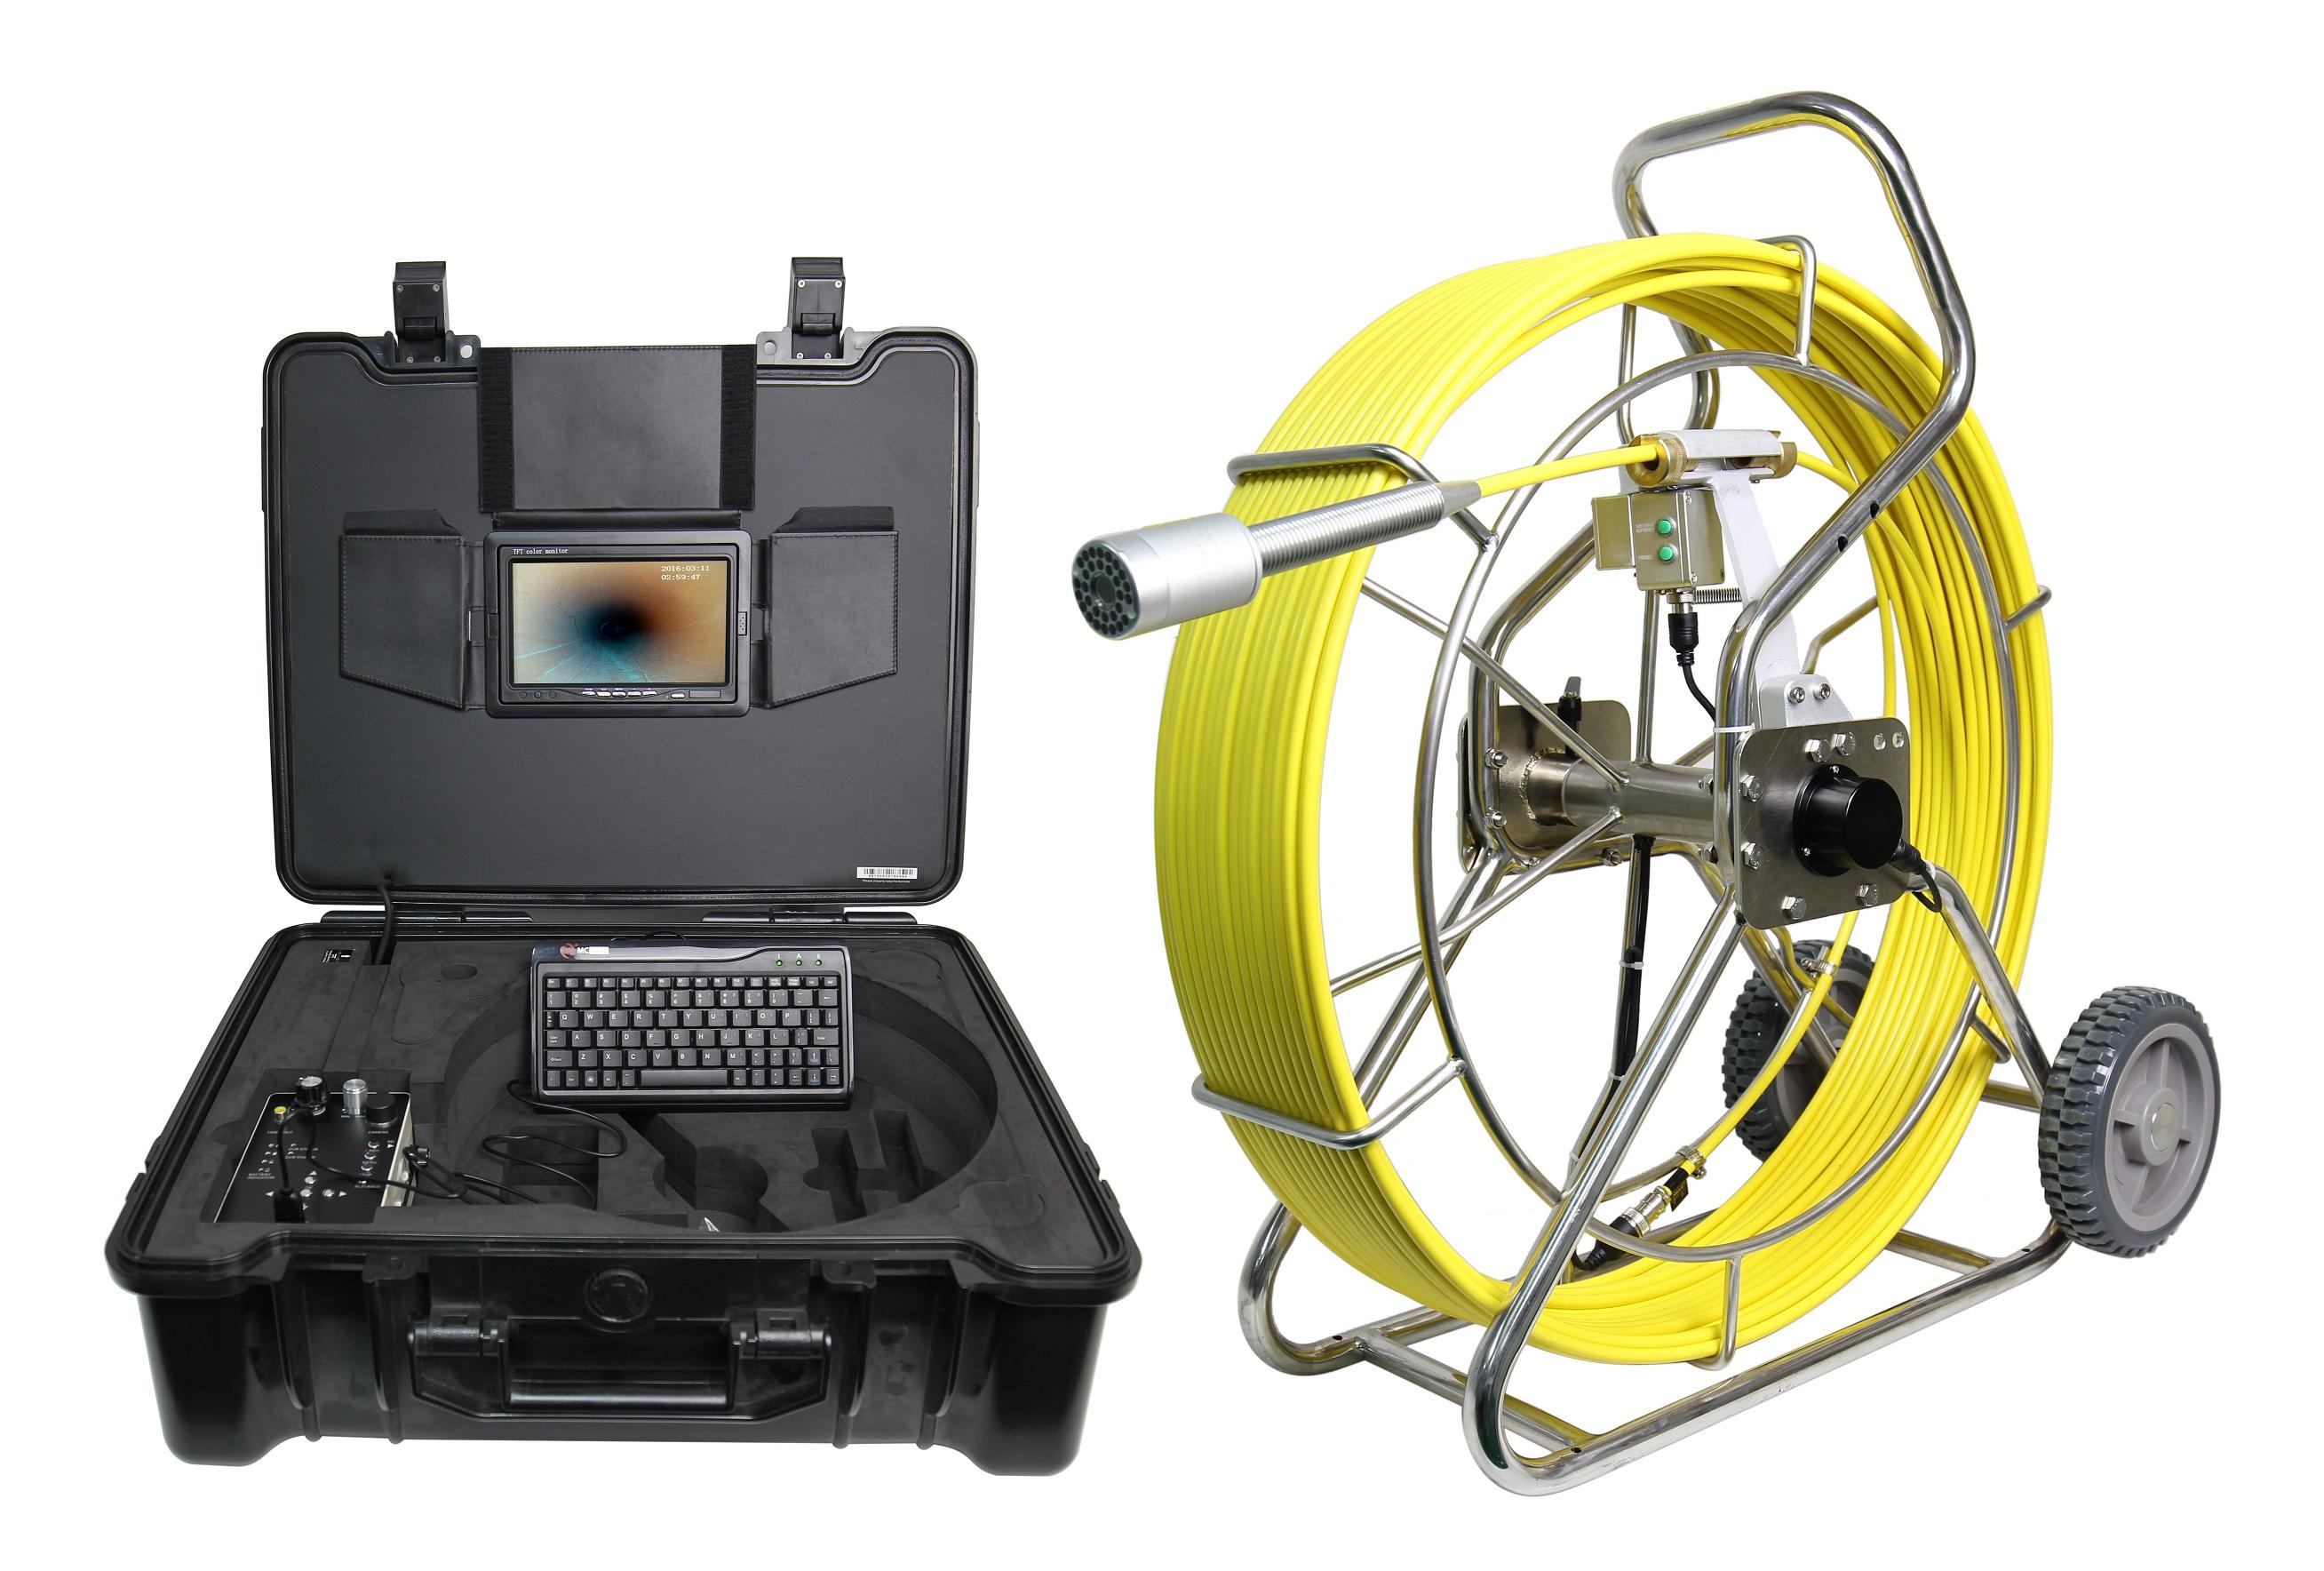 WOPSON 50MM self balance sewer pipe inspection camera